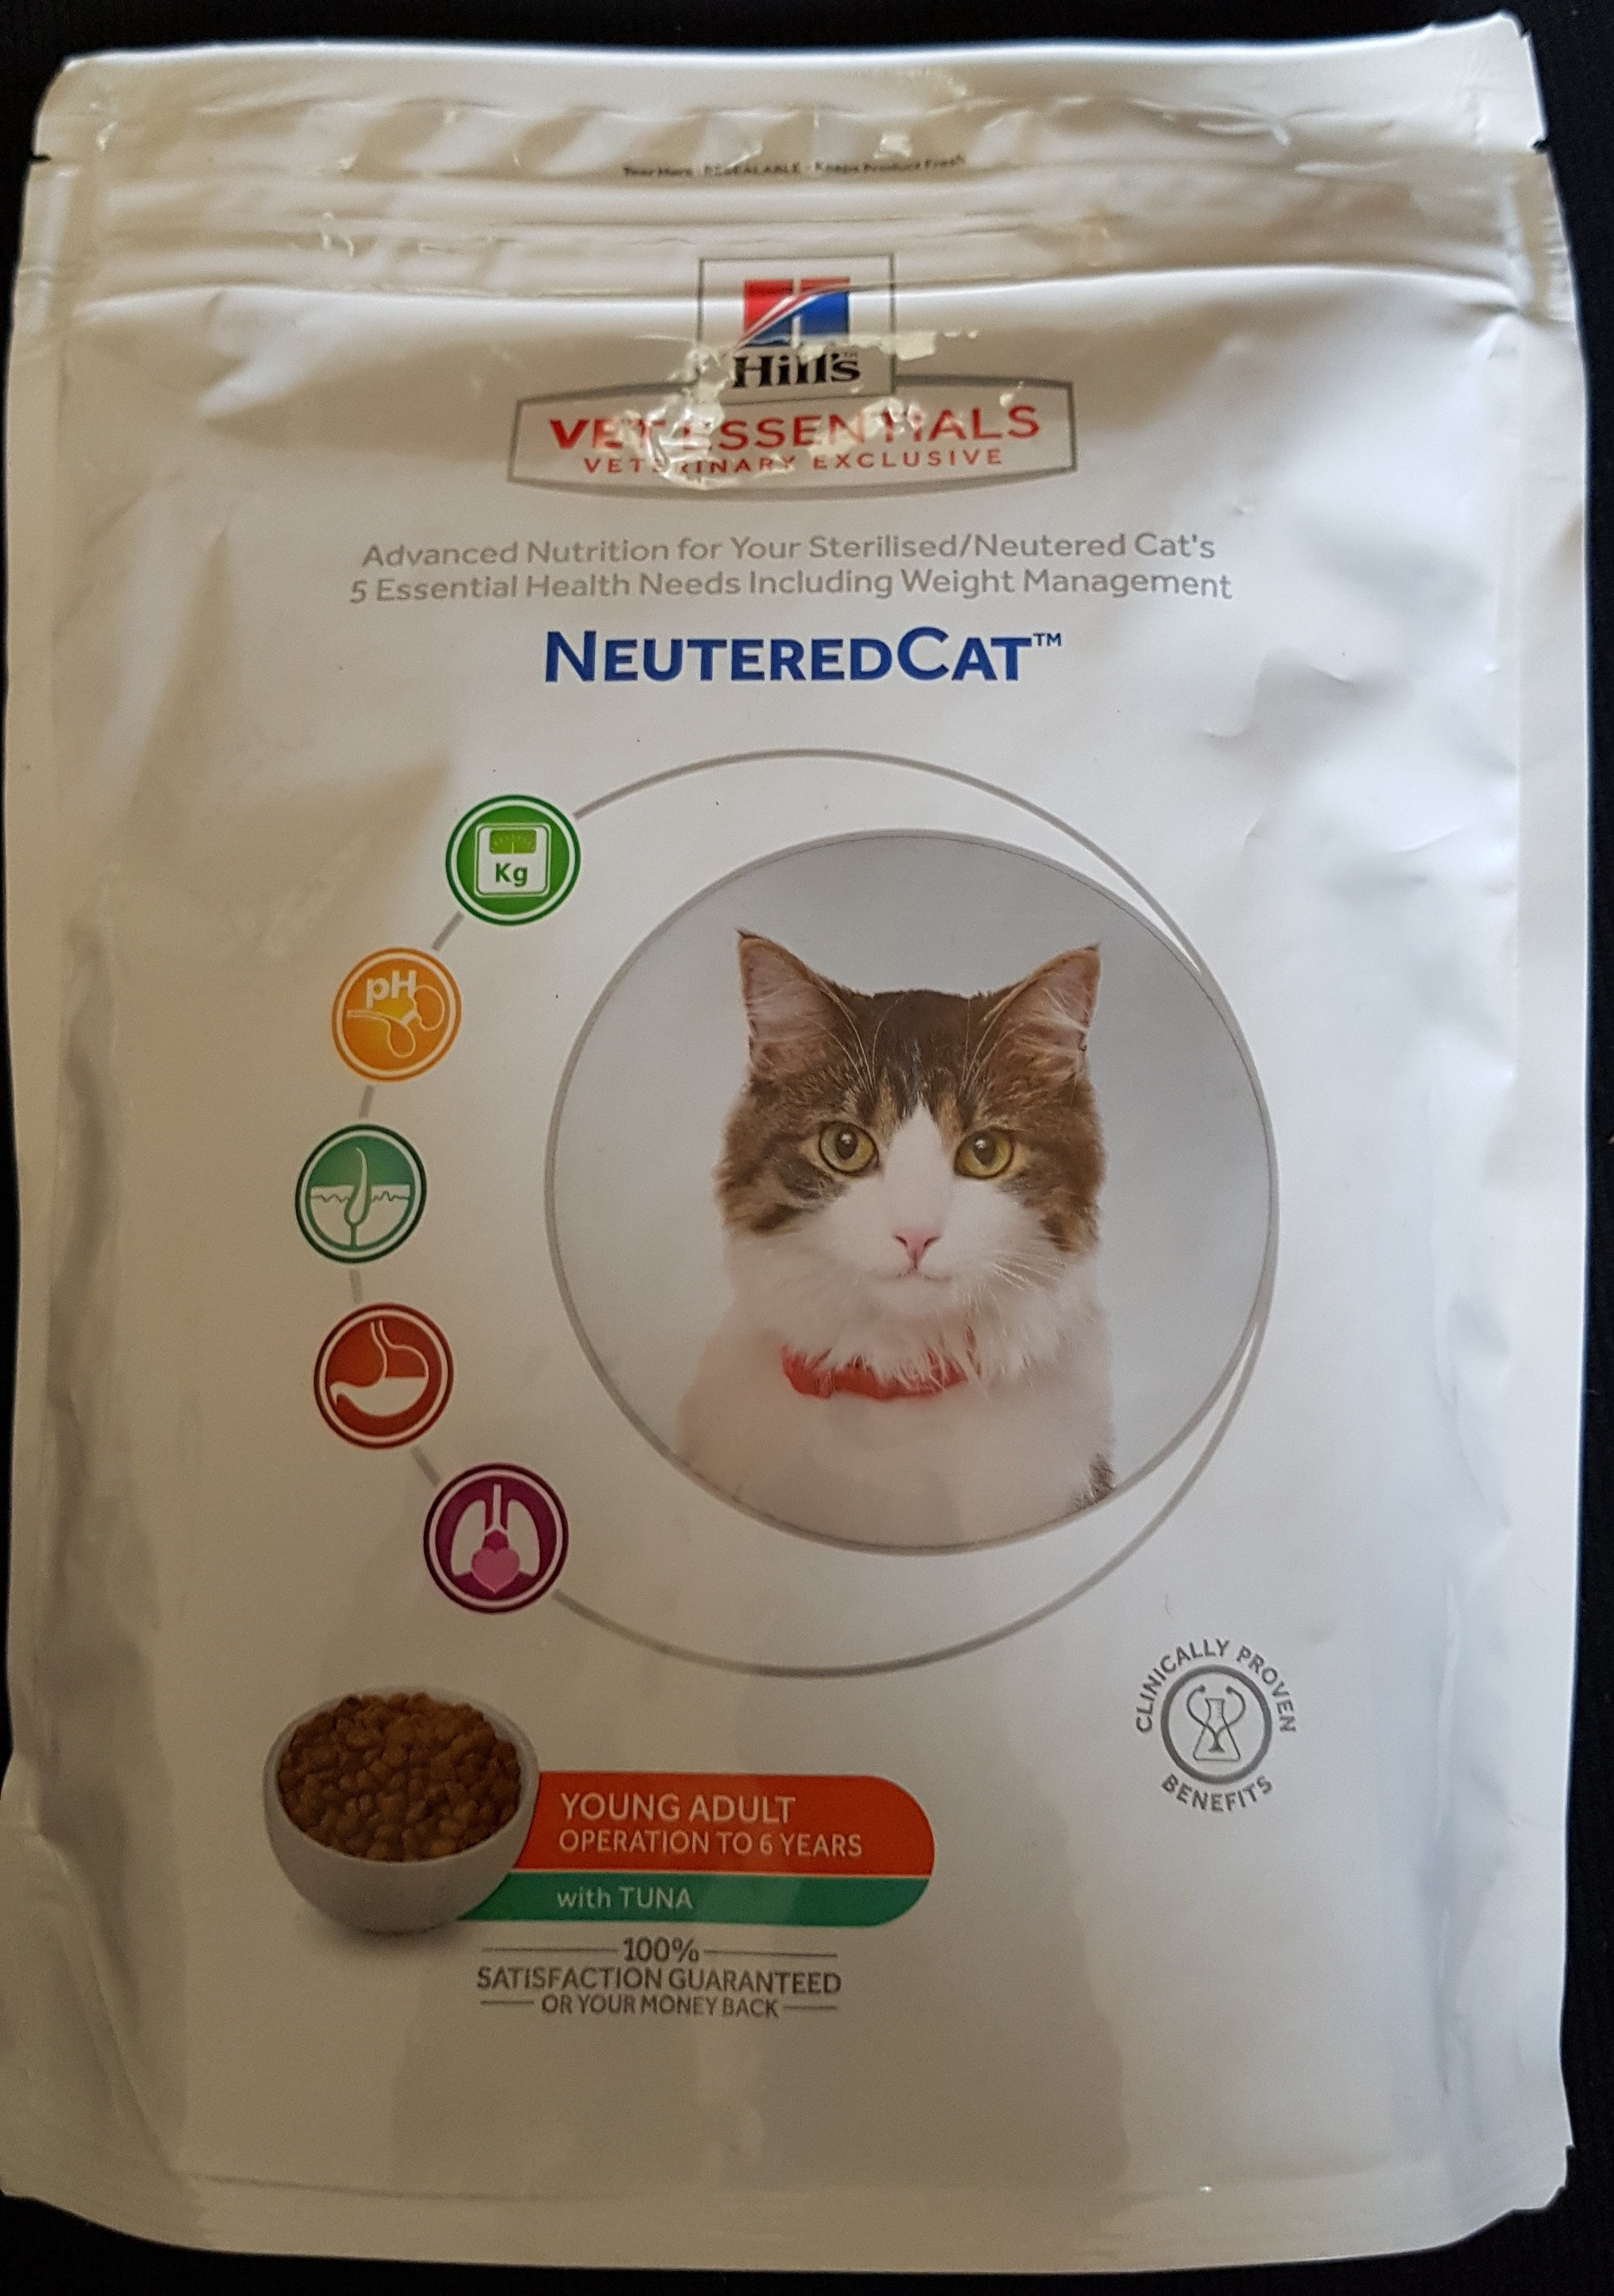 Hill's NeuteredCat - Product - fr